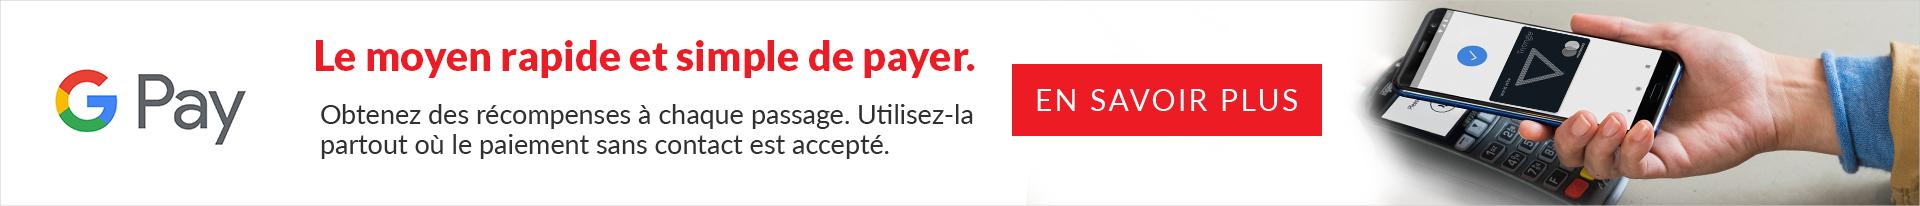 google pay promo